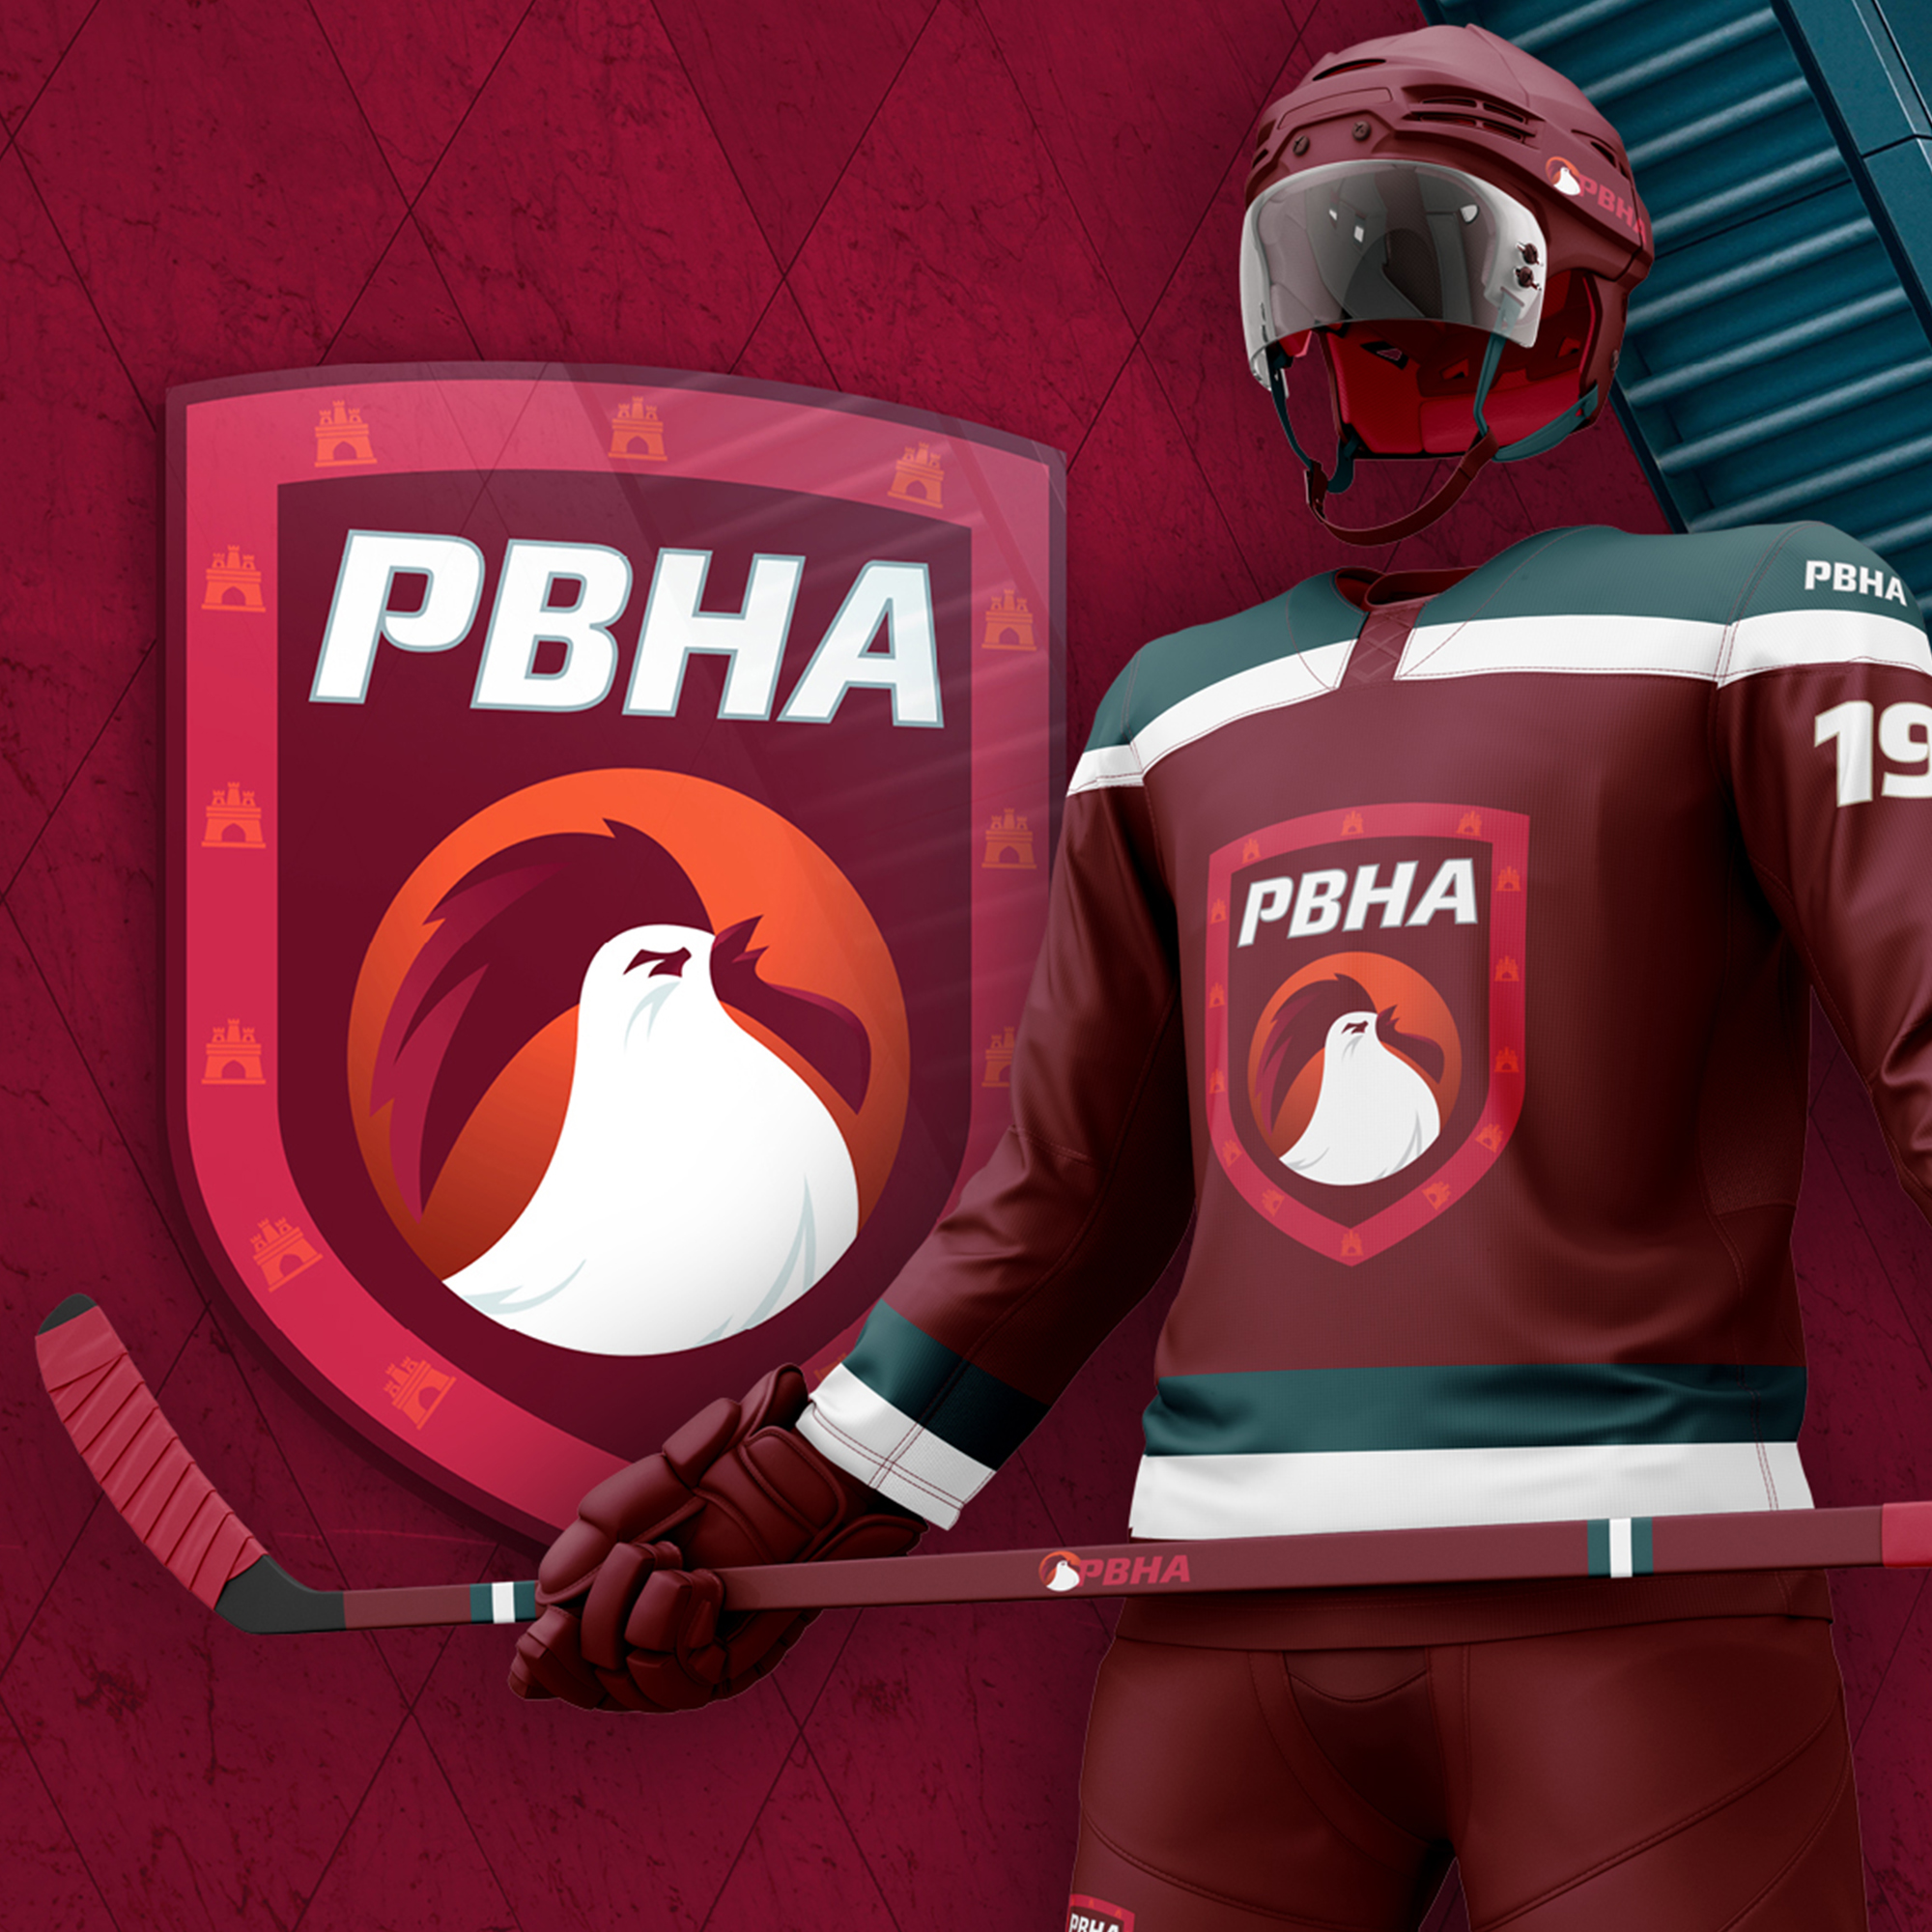 Portuguese Ball Hockey Association